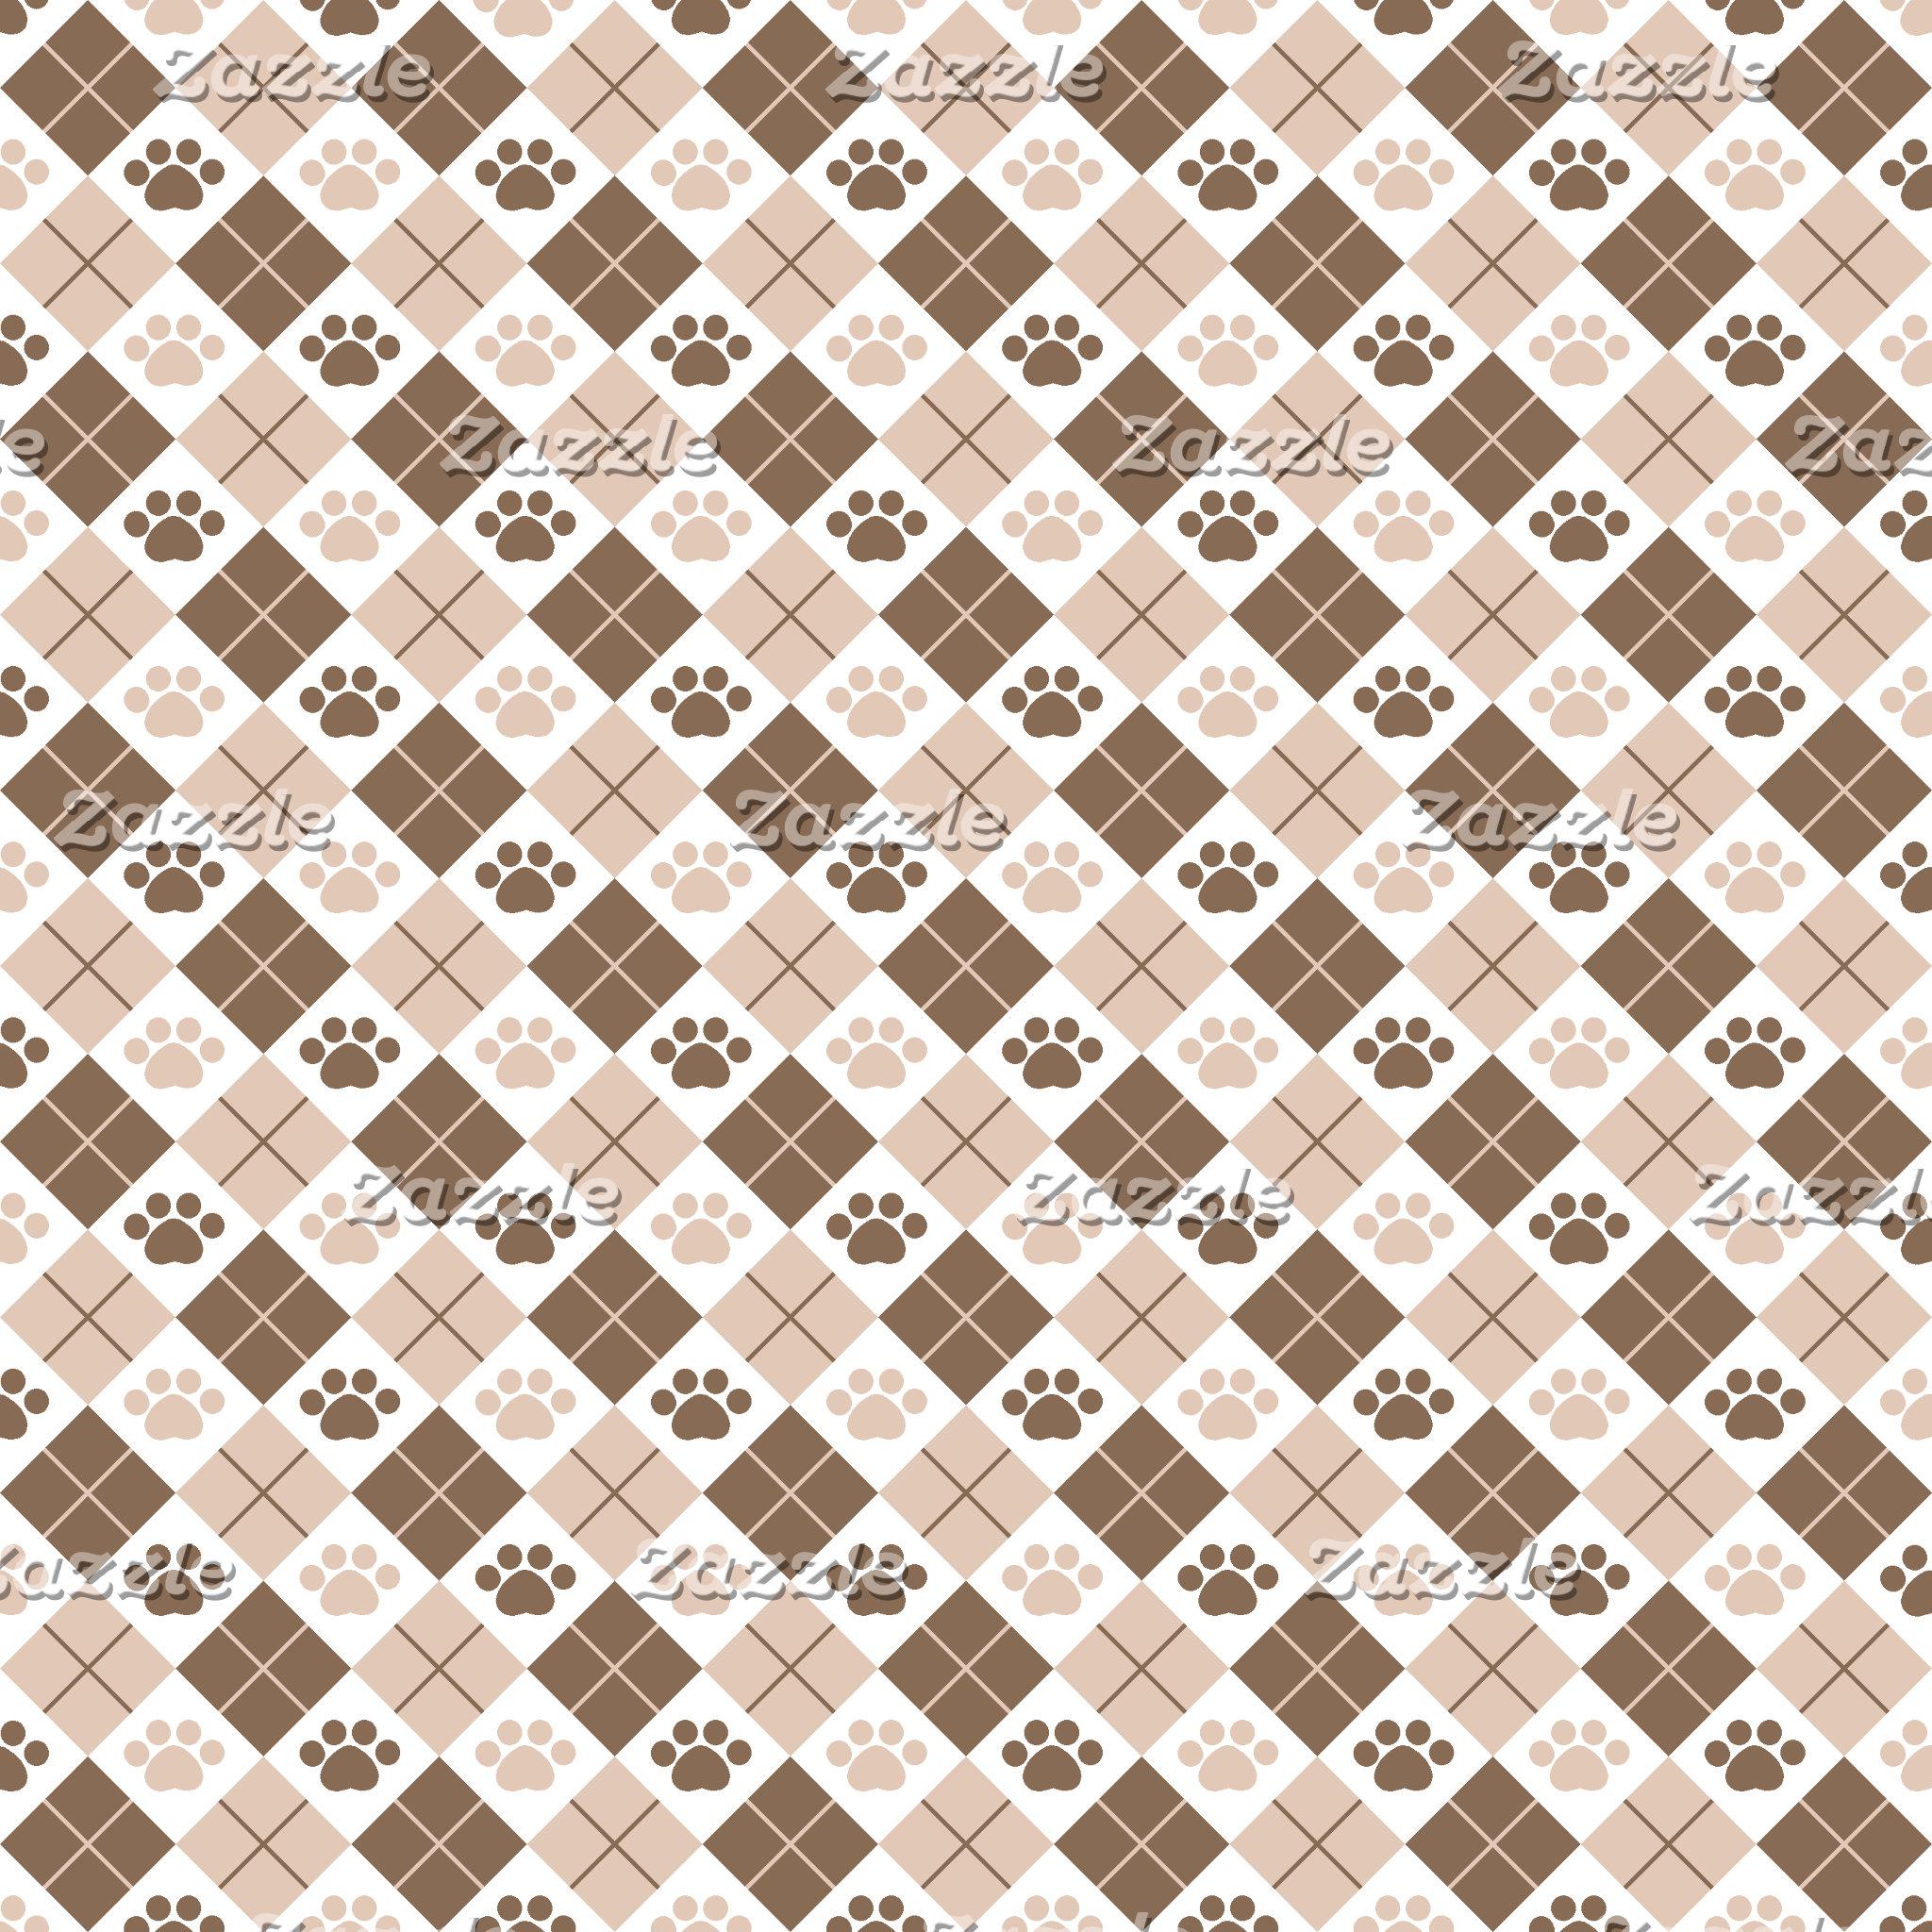 Argyle Paw Print Patterns